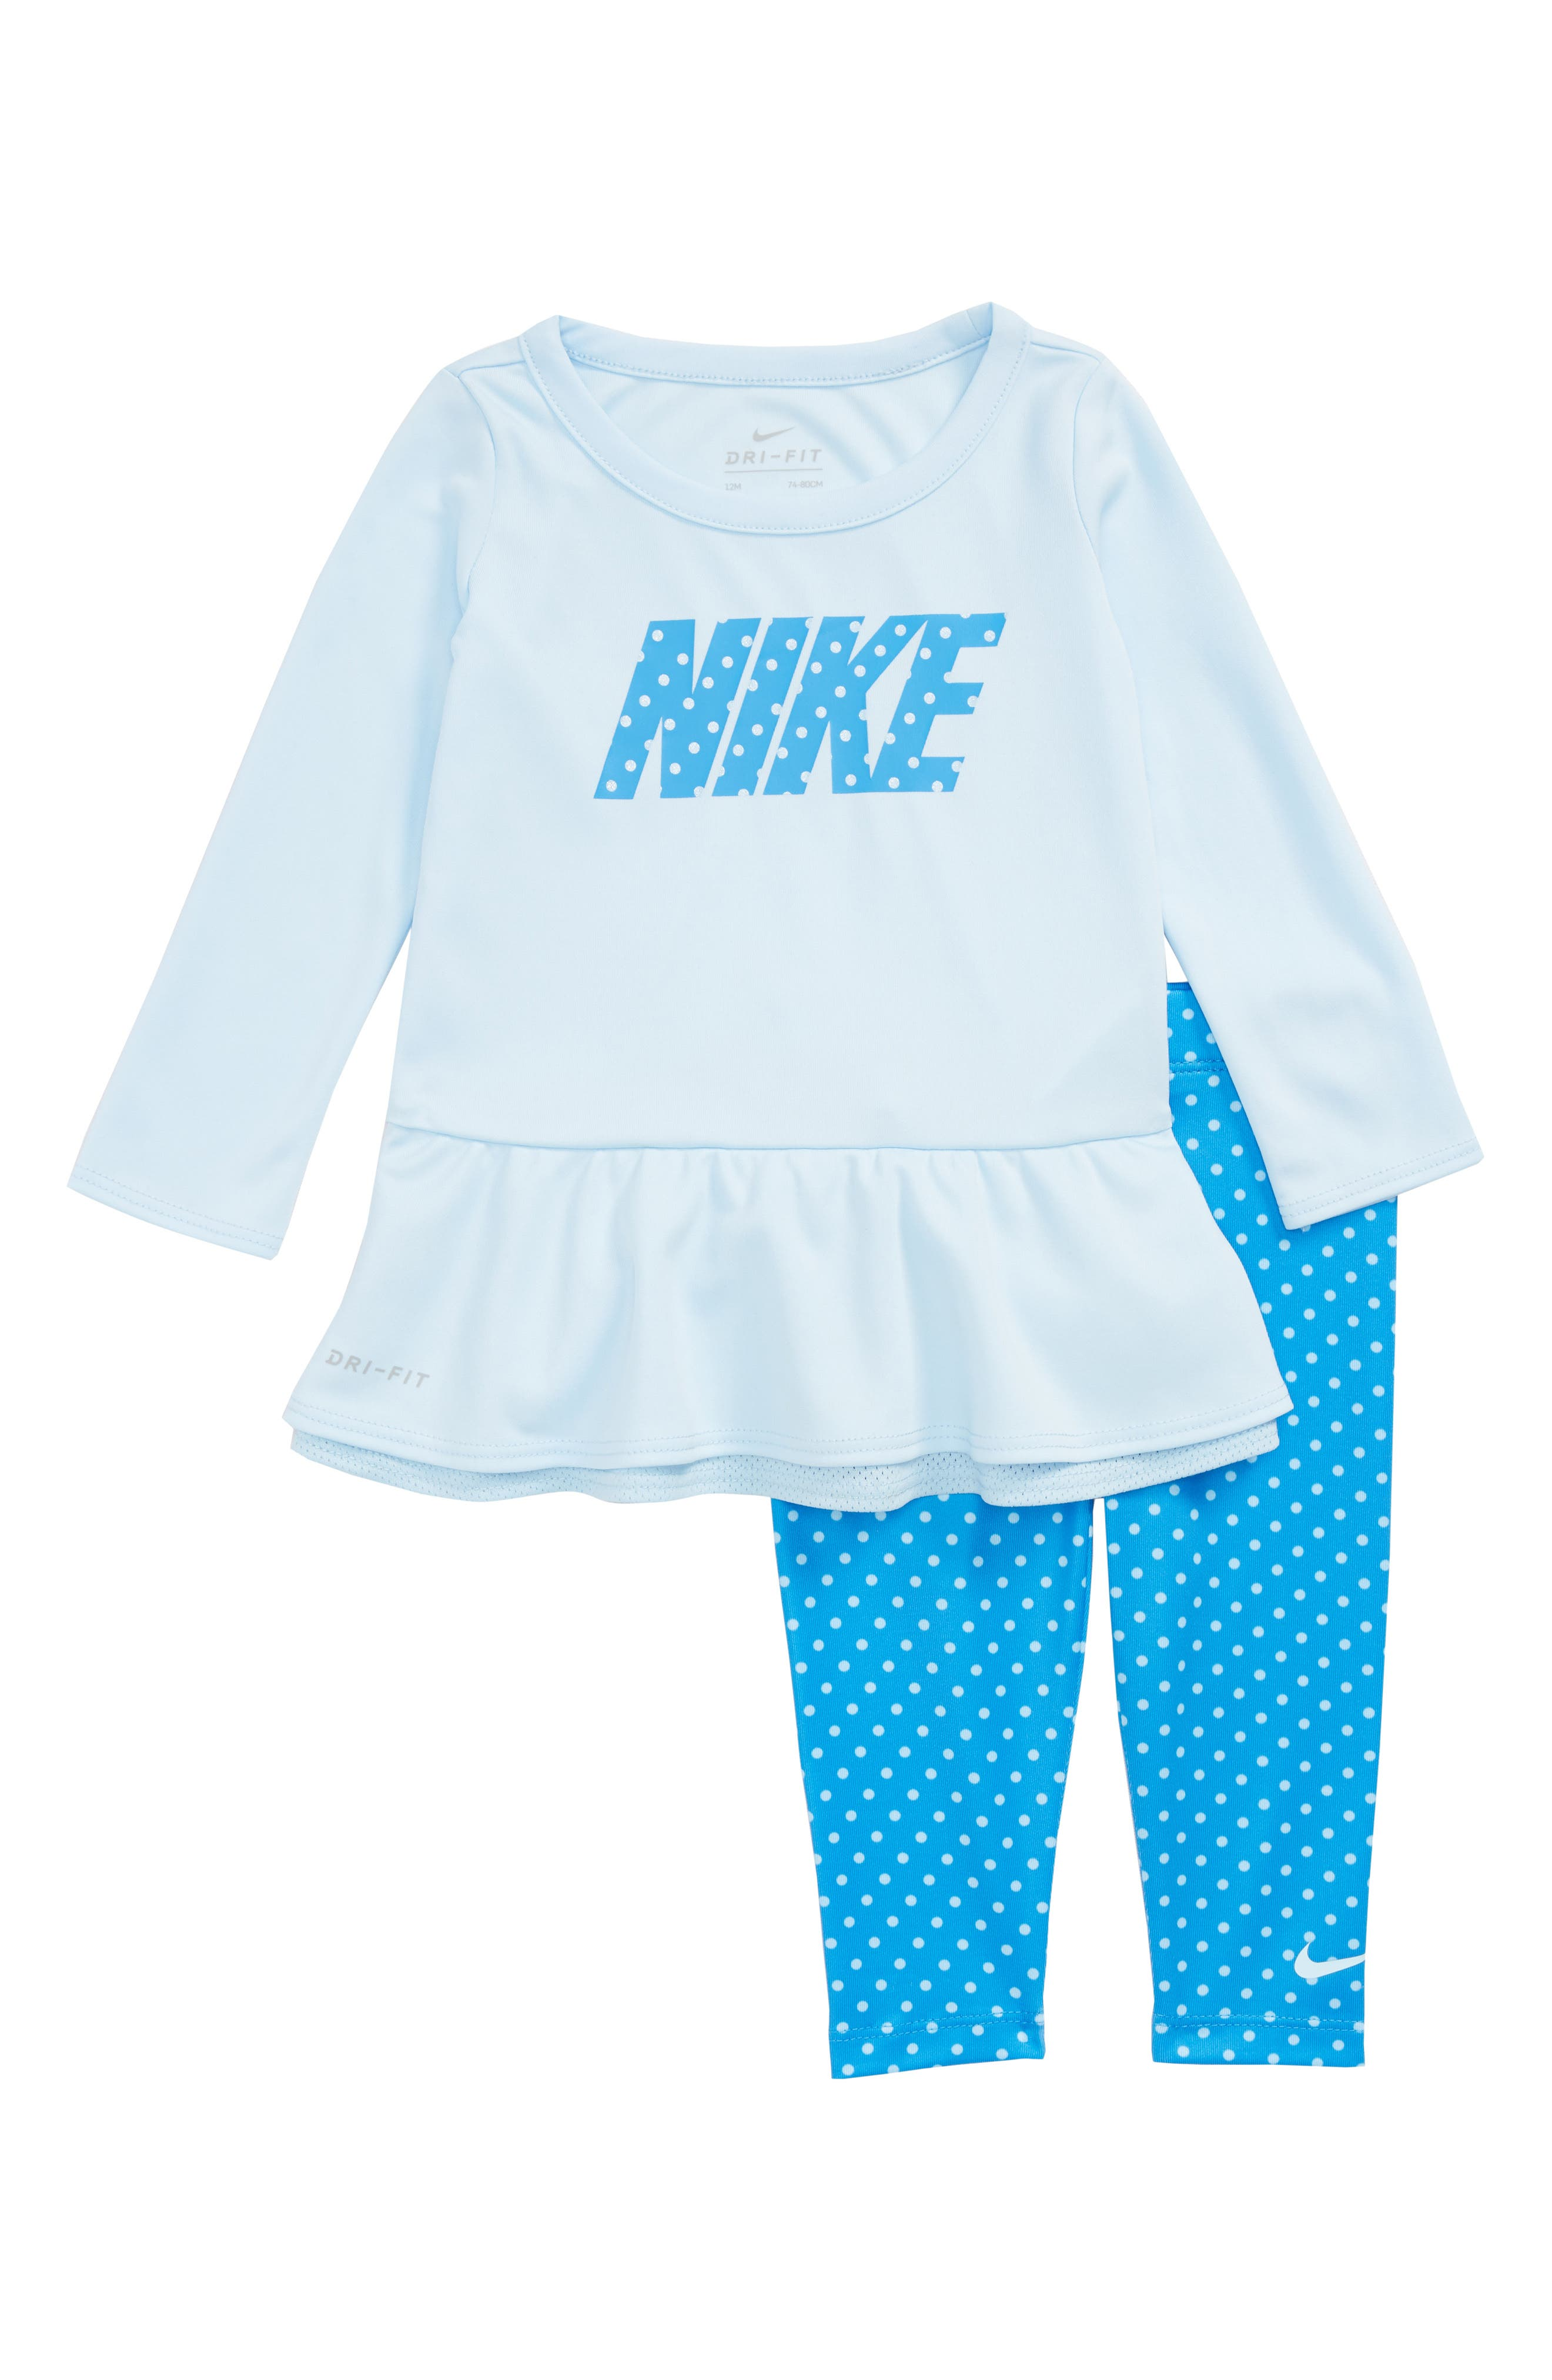 Image of Nike Dri-FIT Peplum Tunic & Leggings Set